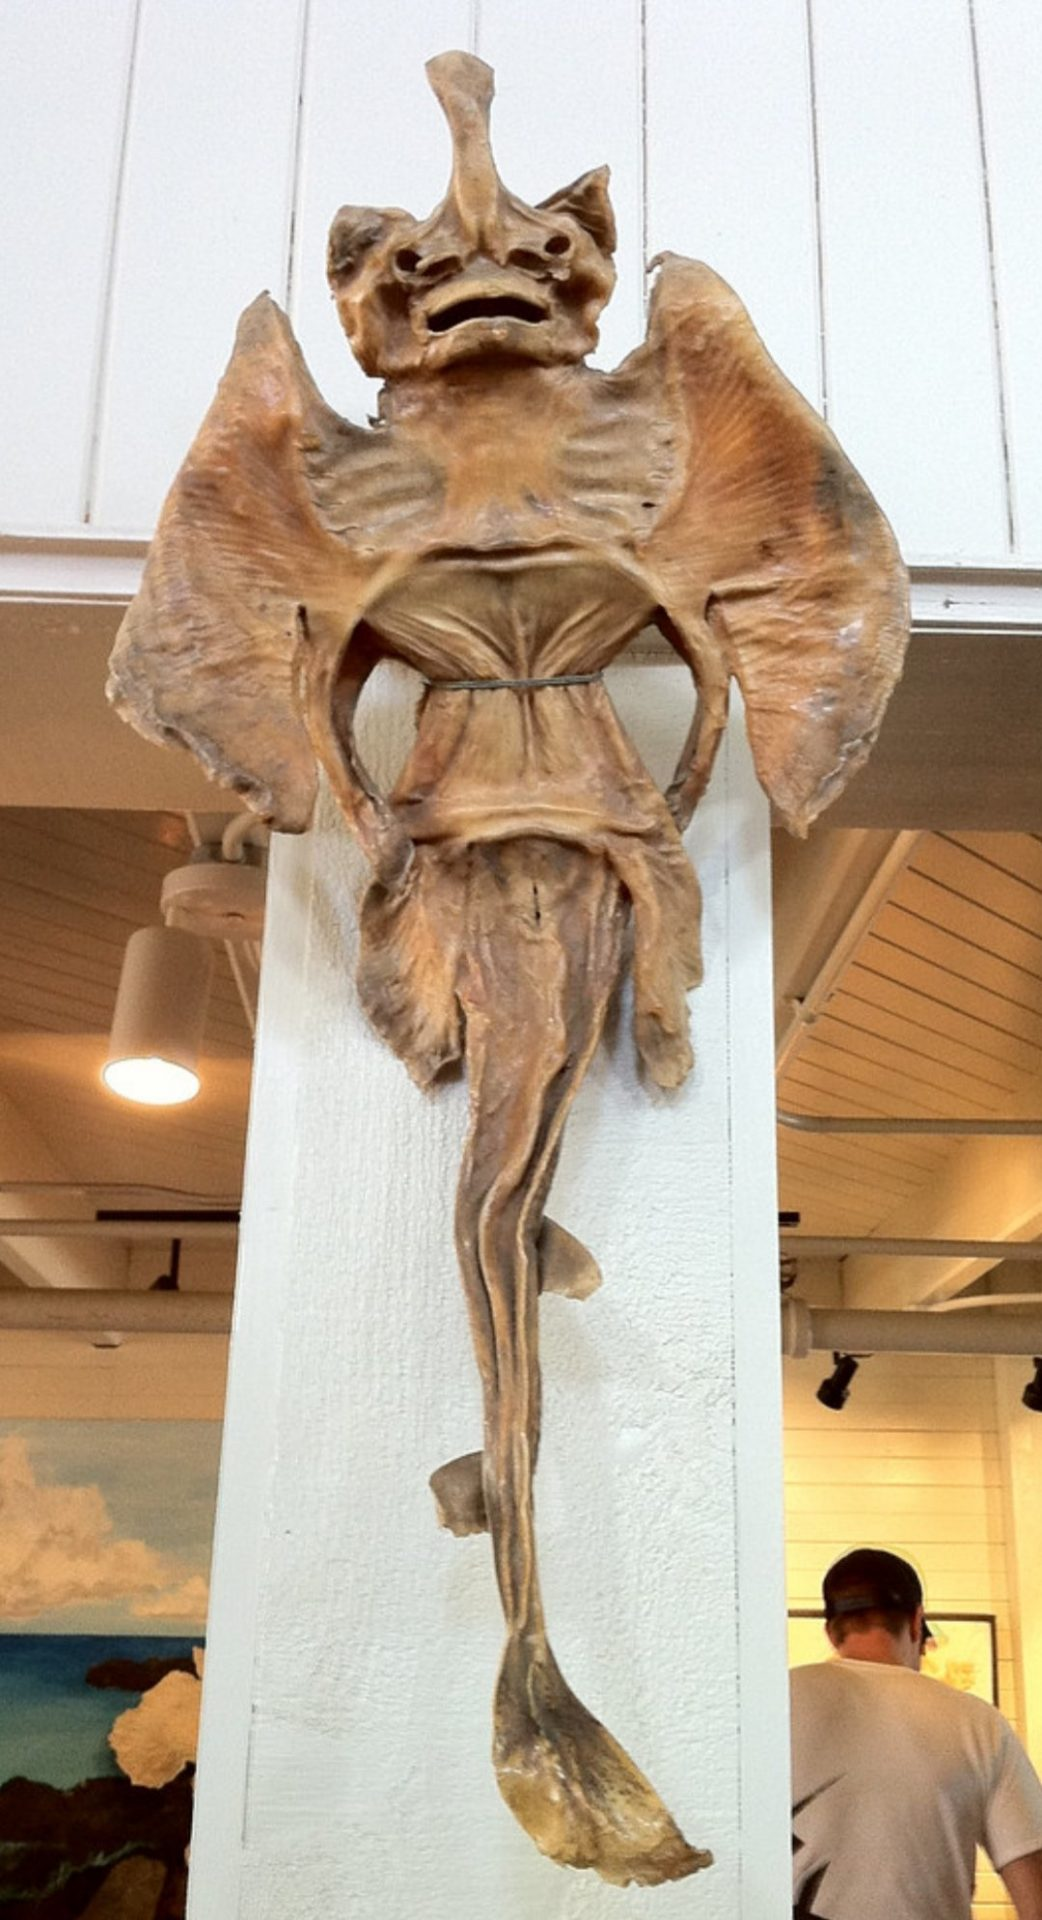 A dried stingray